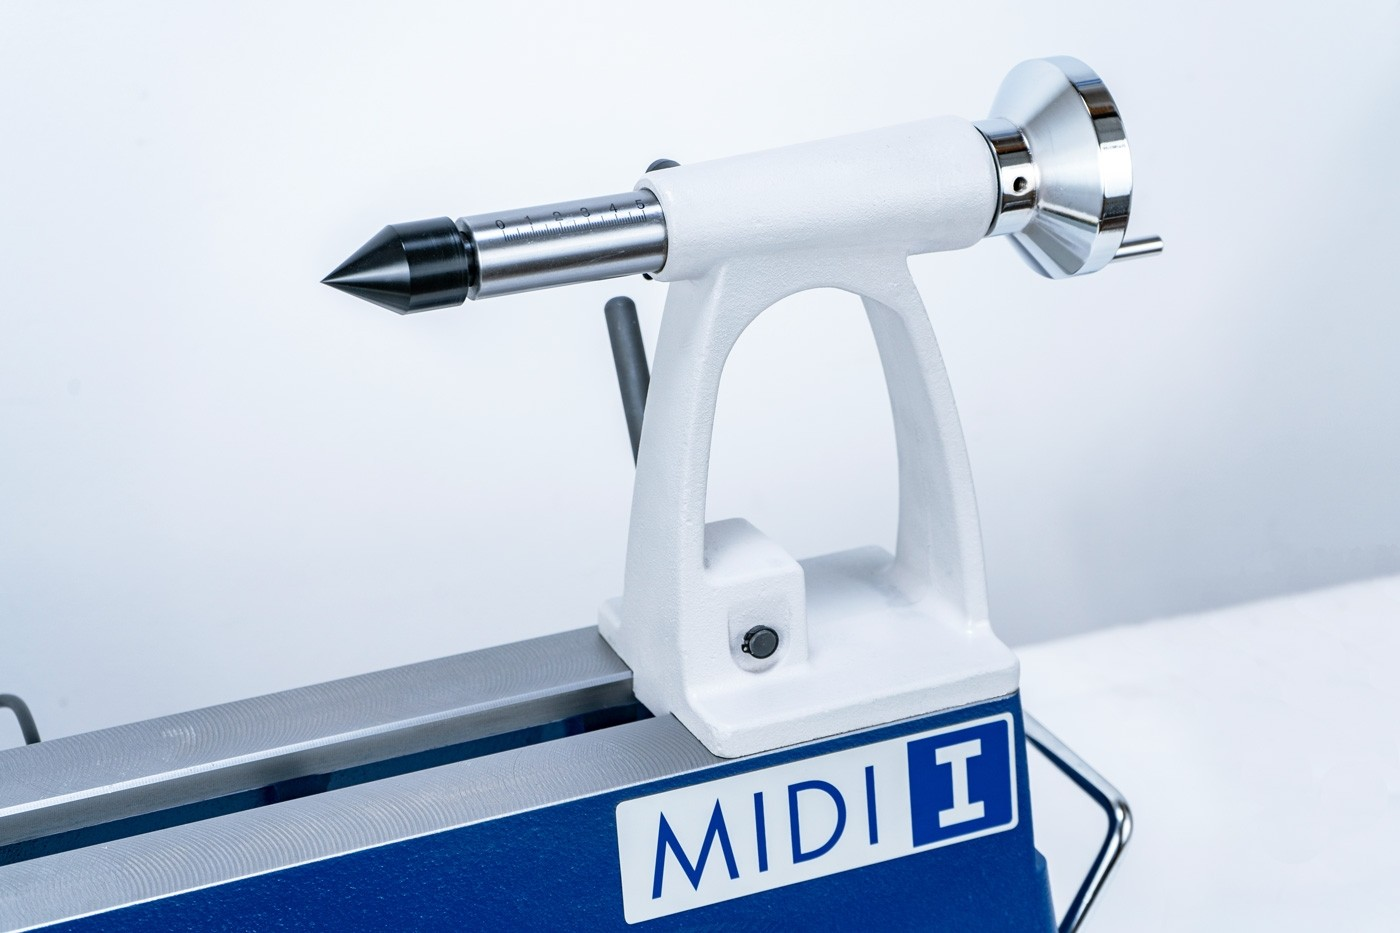 DRECHSELMEISTER MIDI 1